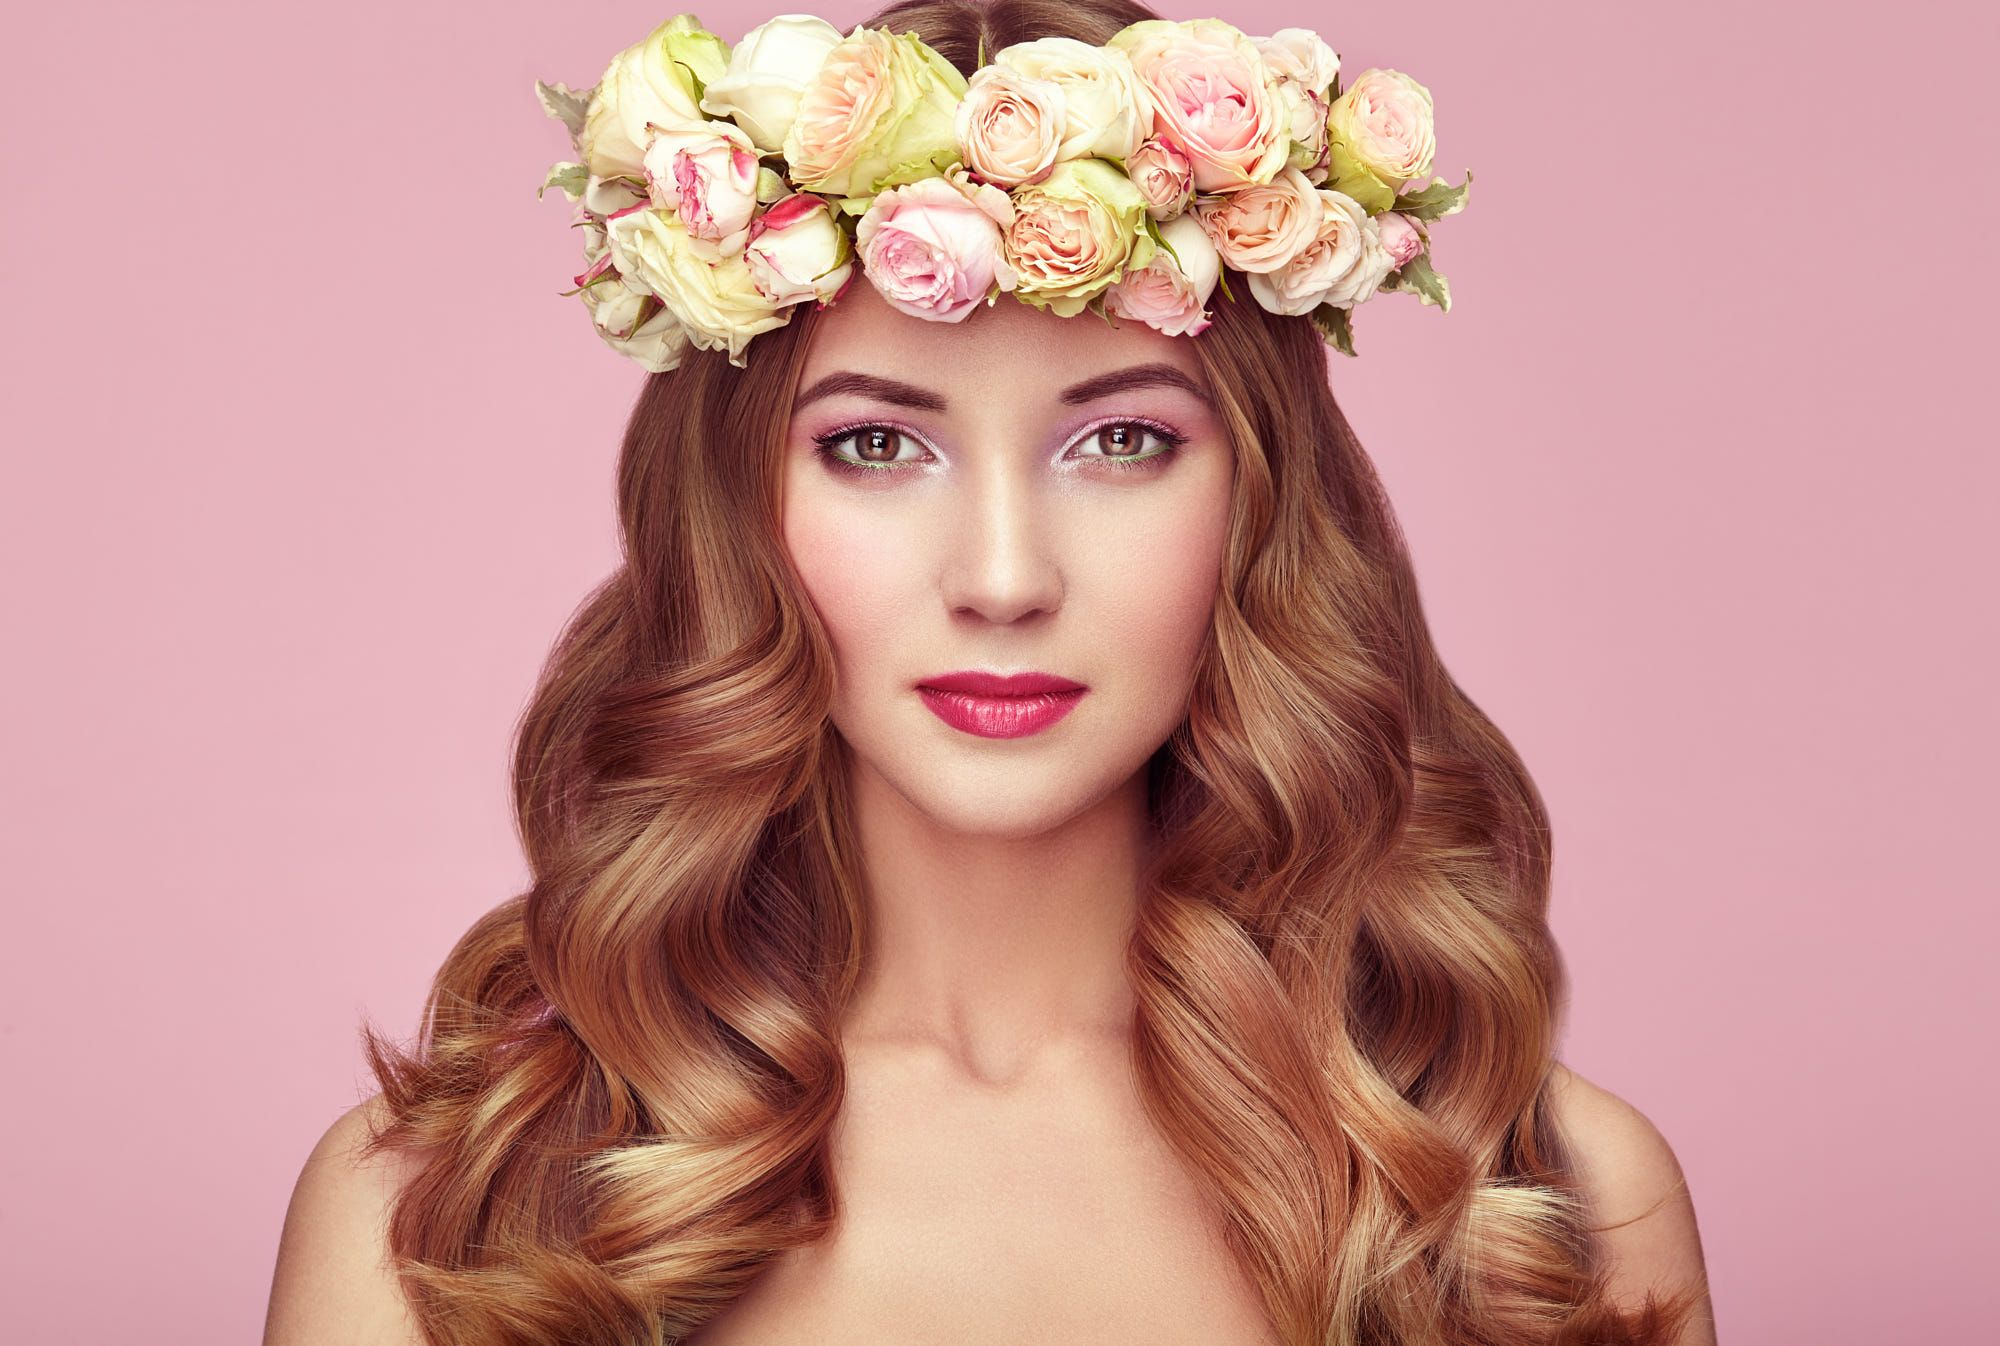 Beautiful blonde woman with flower wreath on her head by oleg gekman beautiful blonde woman with flower wreath on her head by oleg gekman on 500px izmirmasajfo